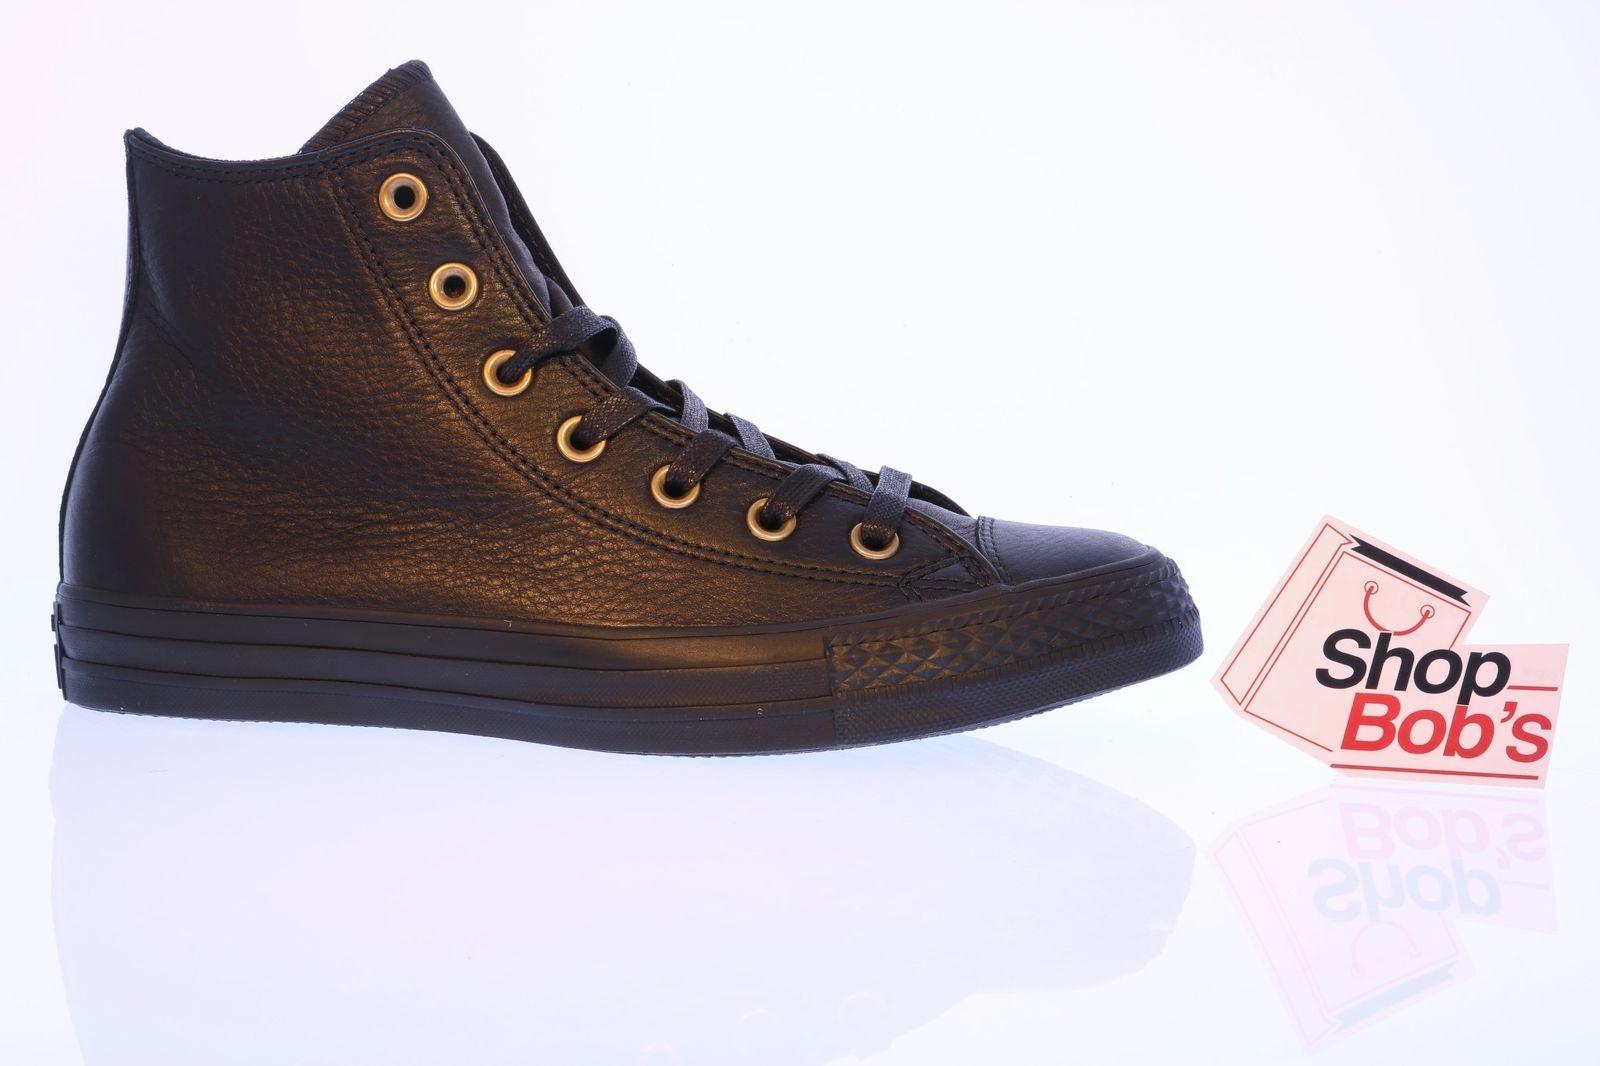 93317cea9516 ... wholesale s l1600. s l1600. nib converse custom chuck taylor all star  black leather ...